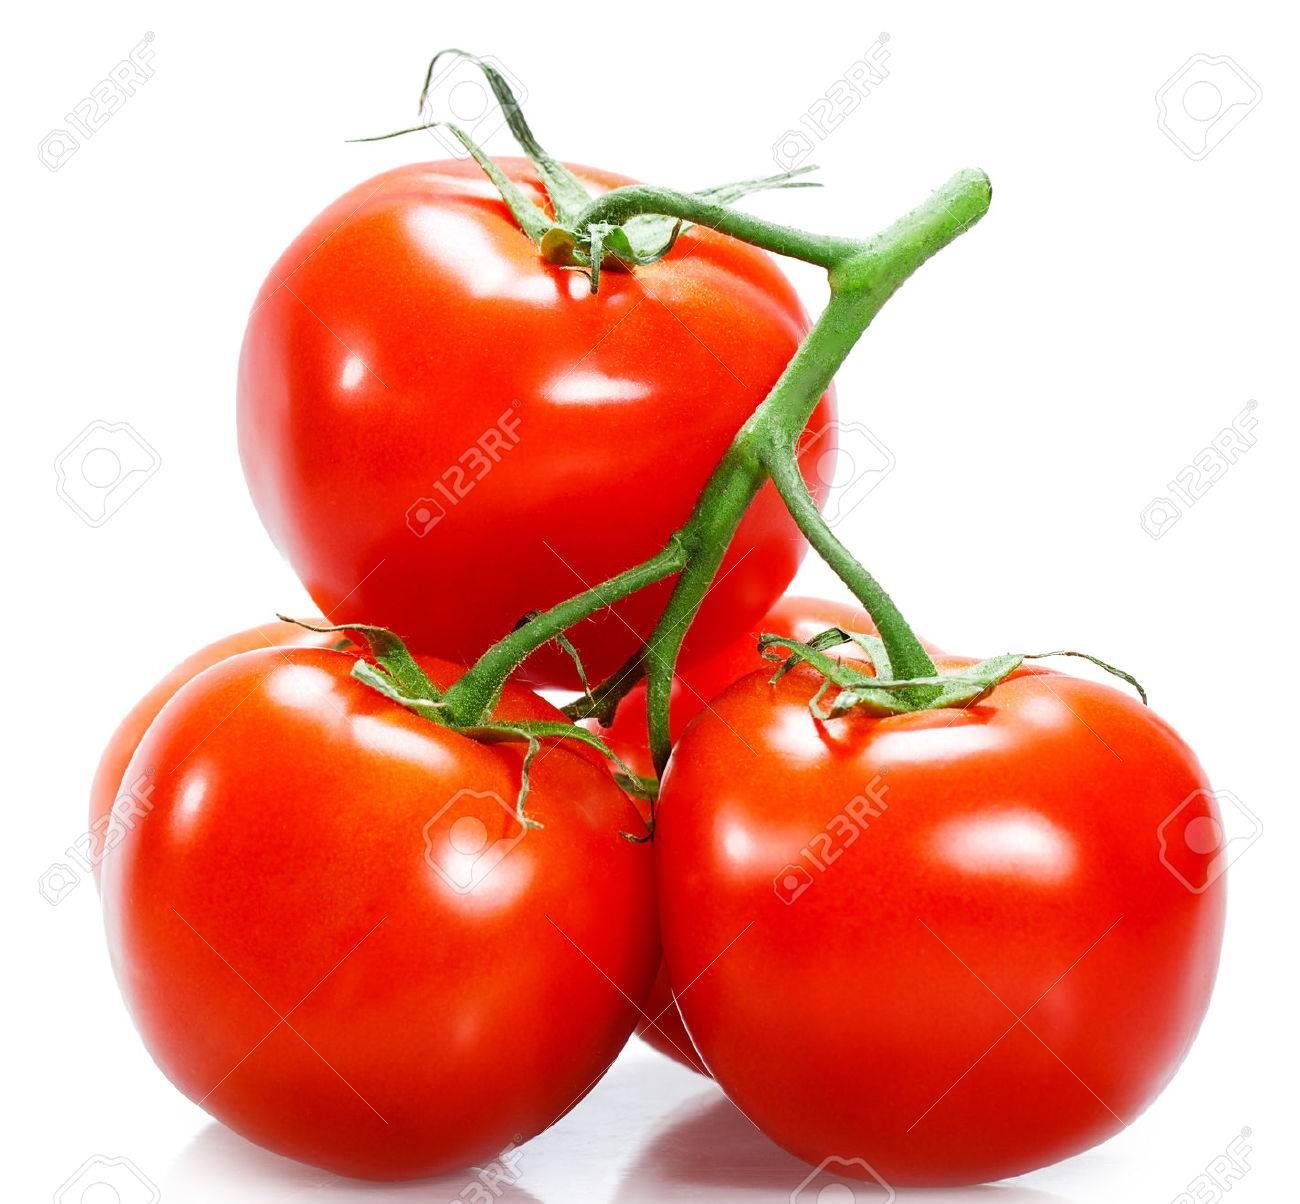 tomatoes Isolated on white background - 51408141